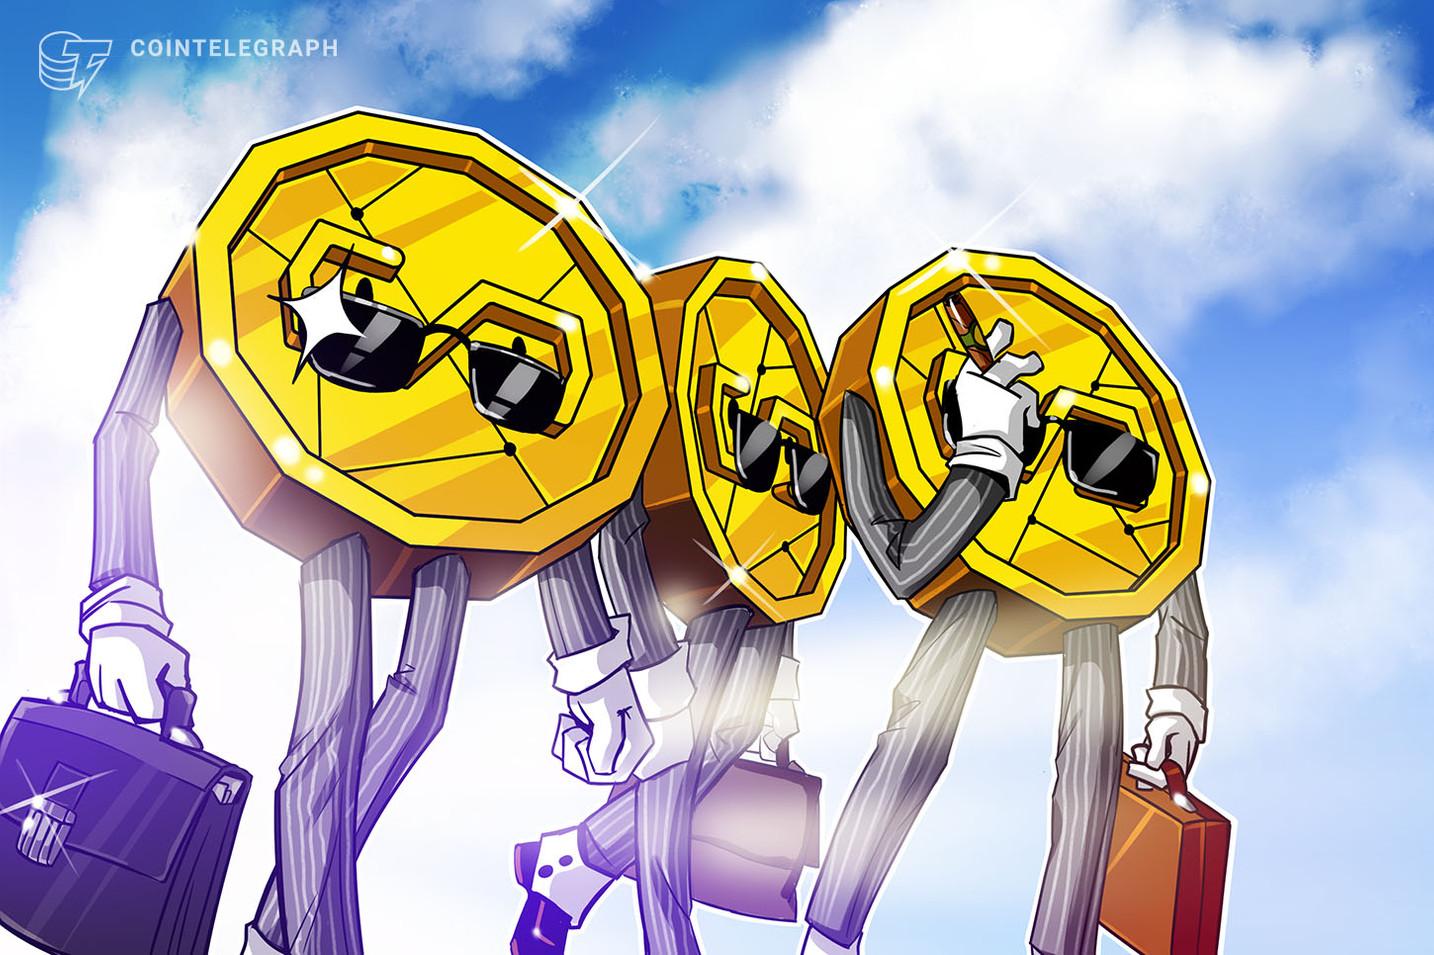 Peruvian stablecoin launches on Stellar blockchain